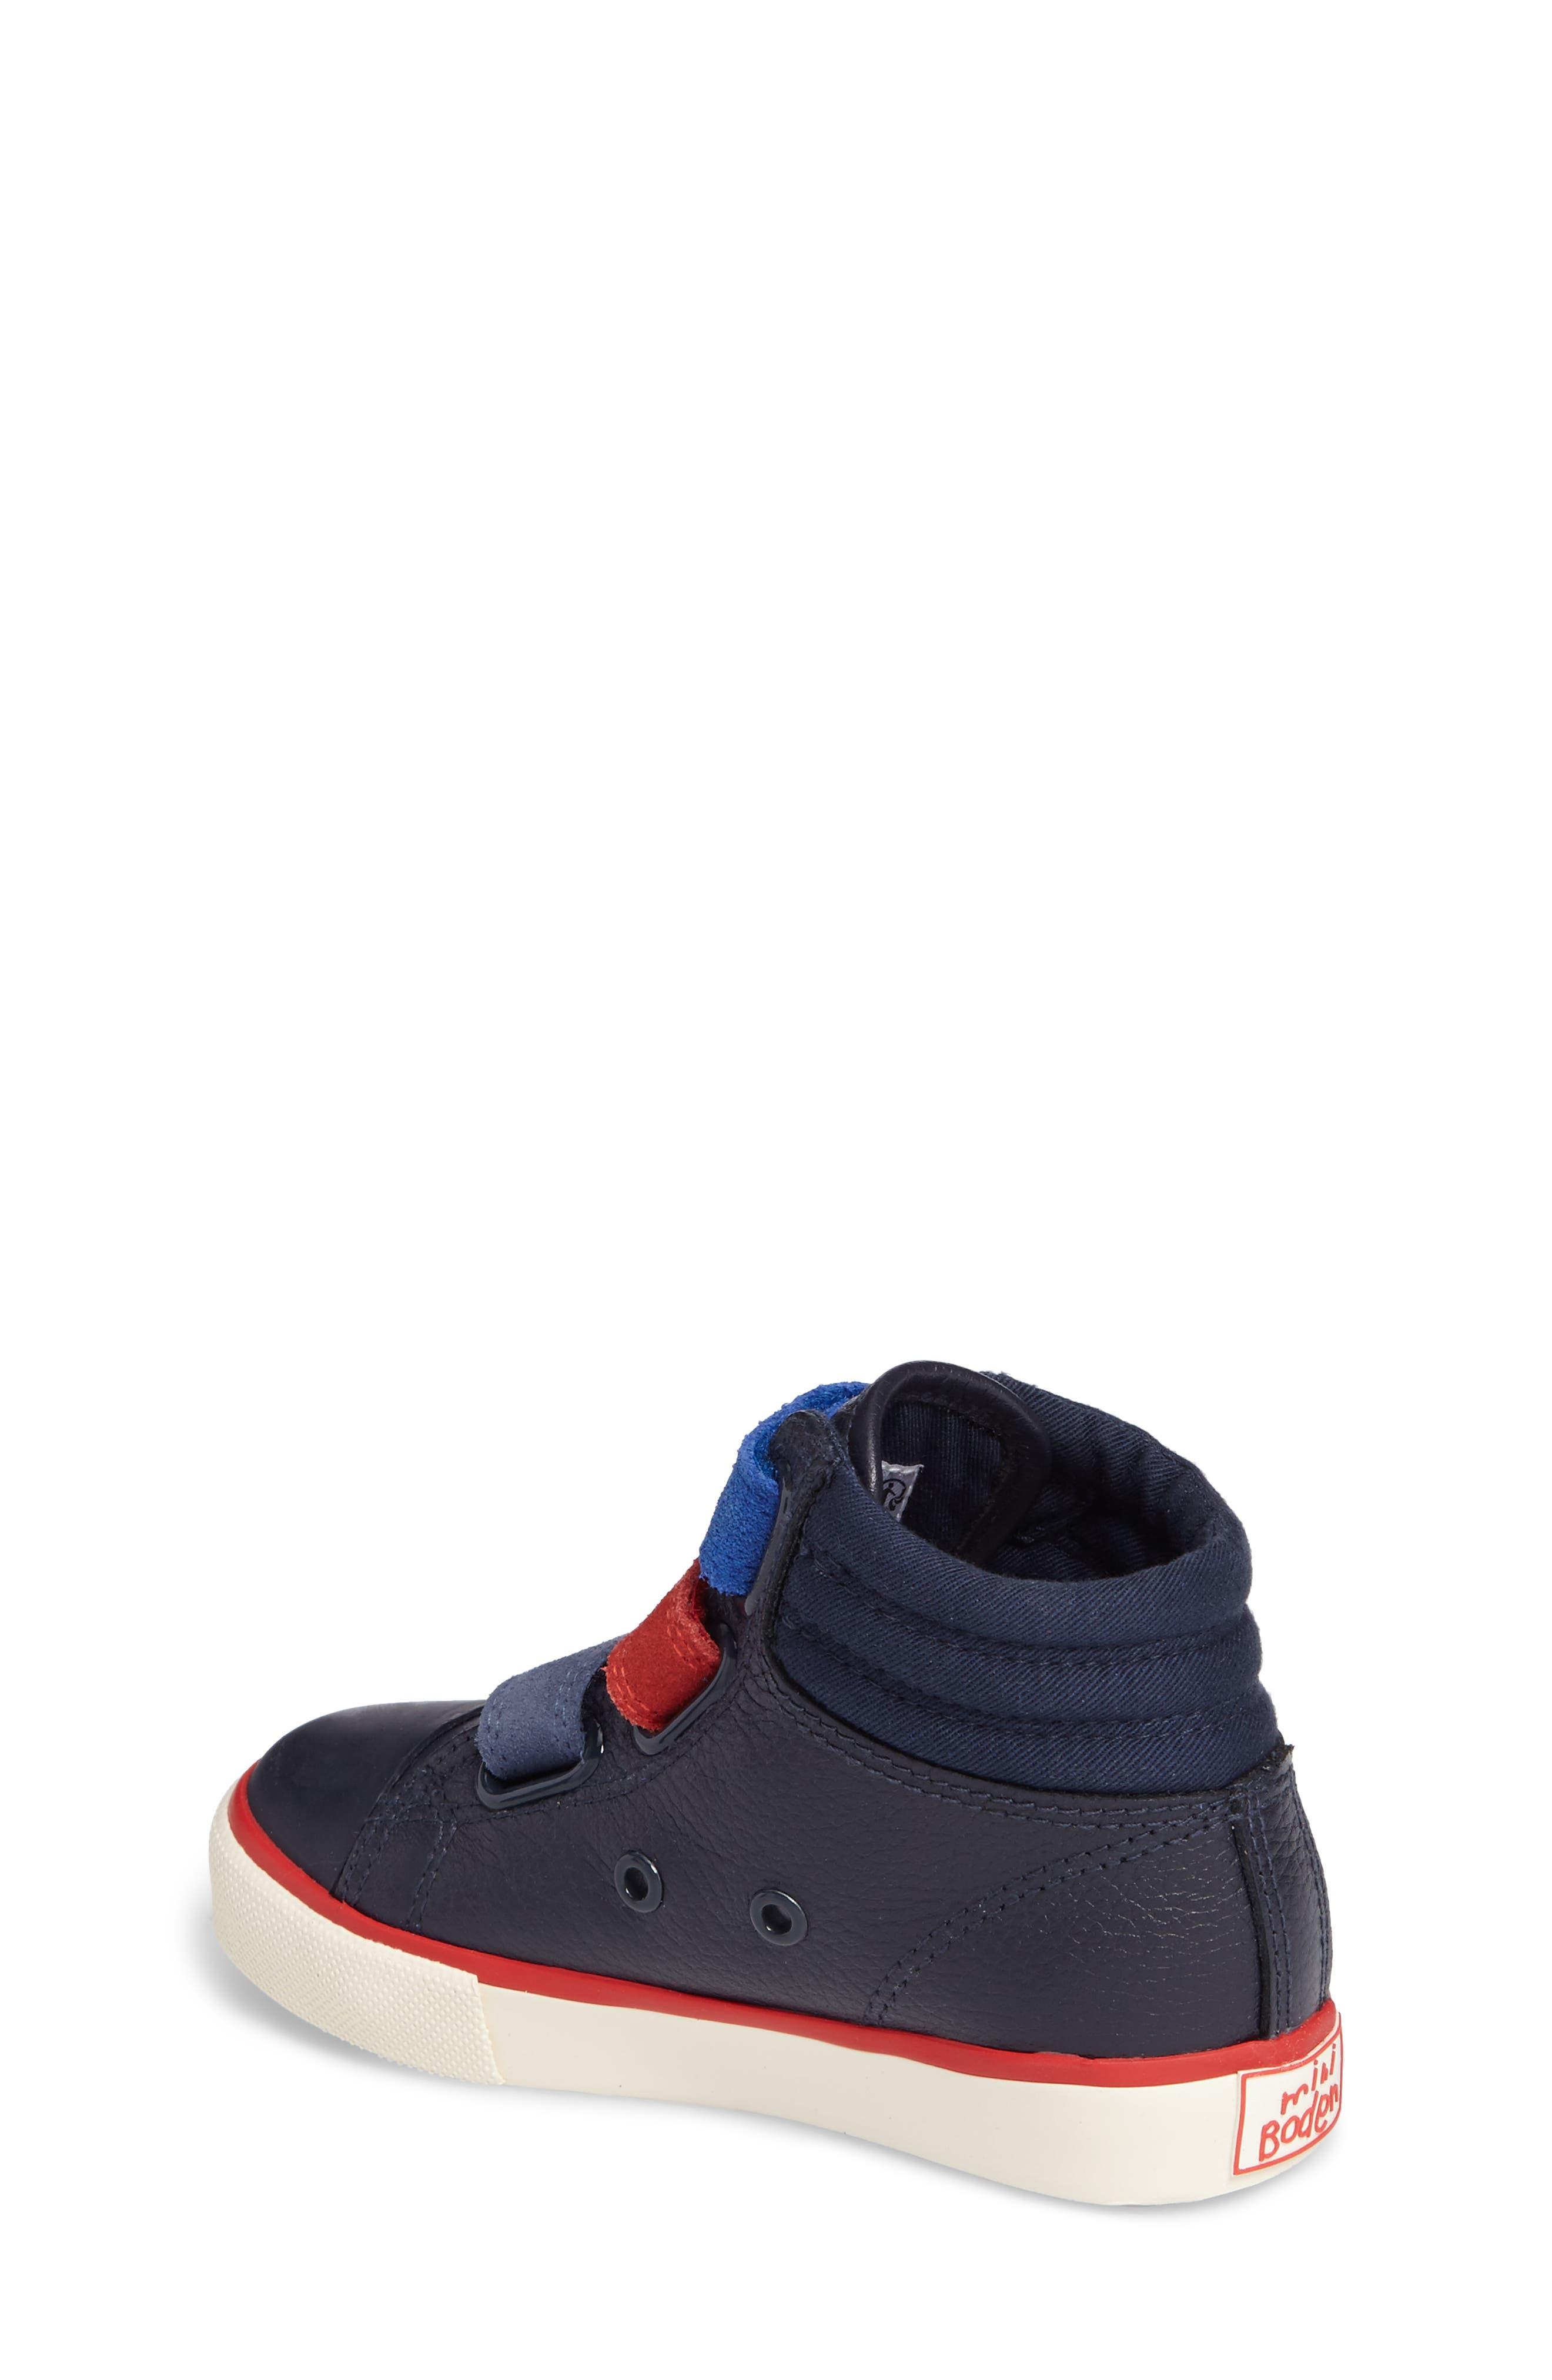 High Top Sneaker,                             Alternate thumbnail 2, color,                             Navy